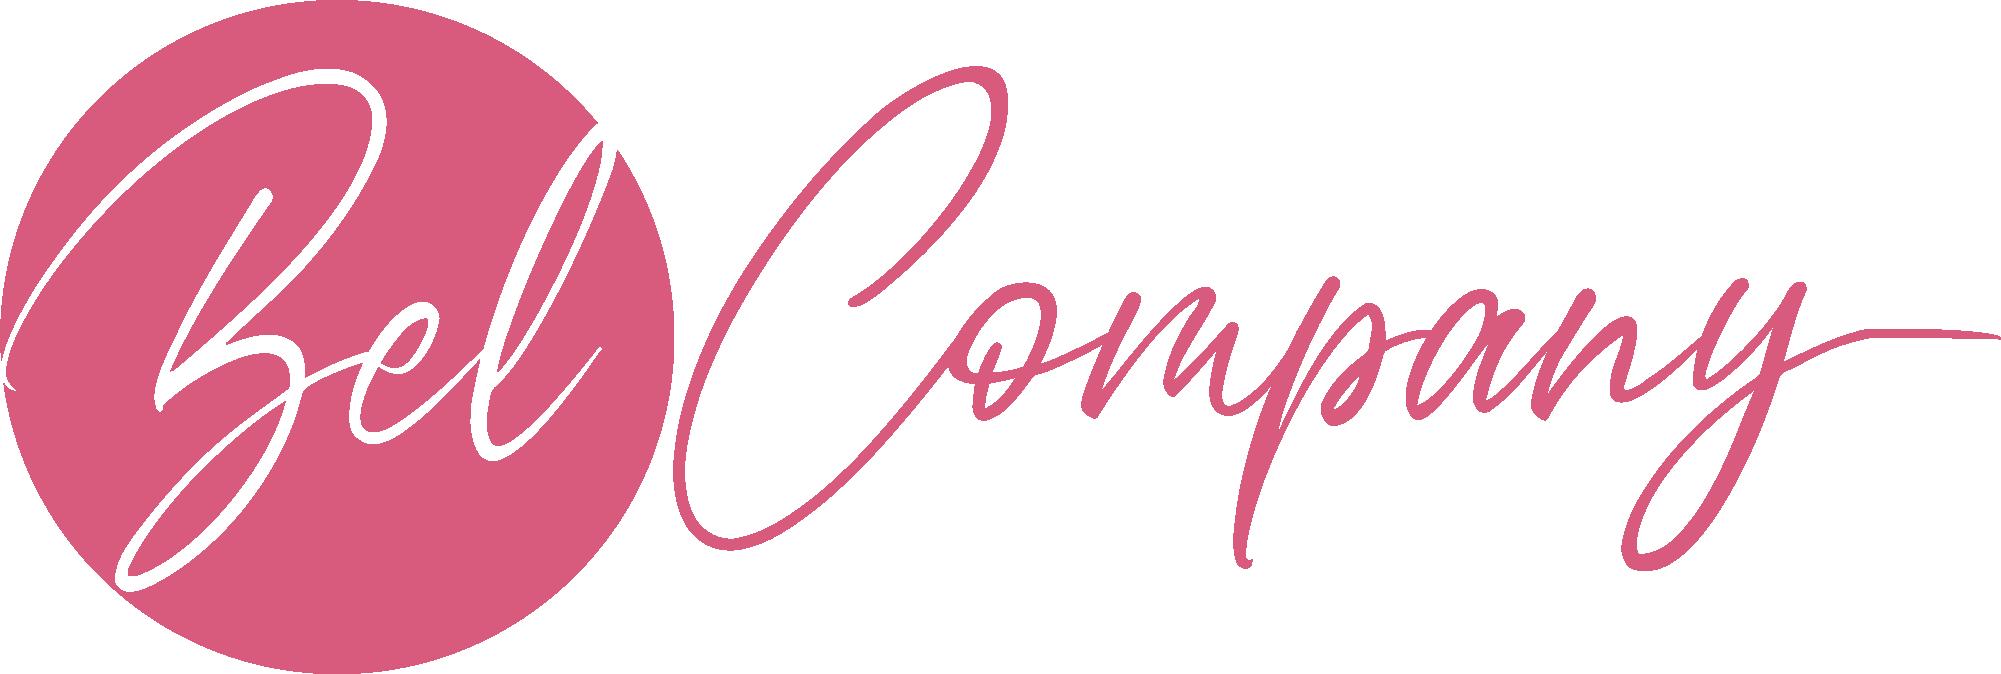 Belcompany - Shopmanicure